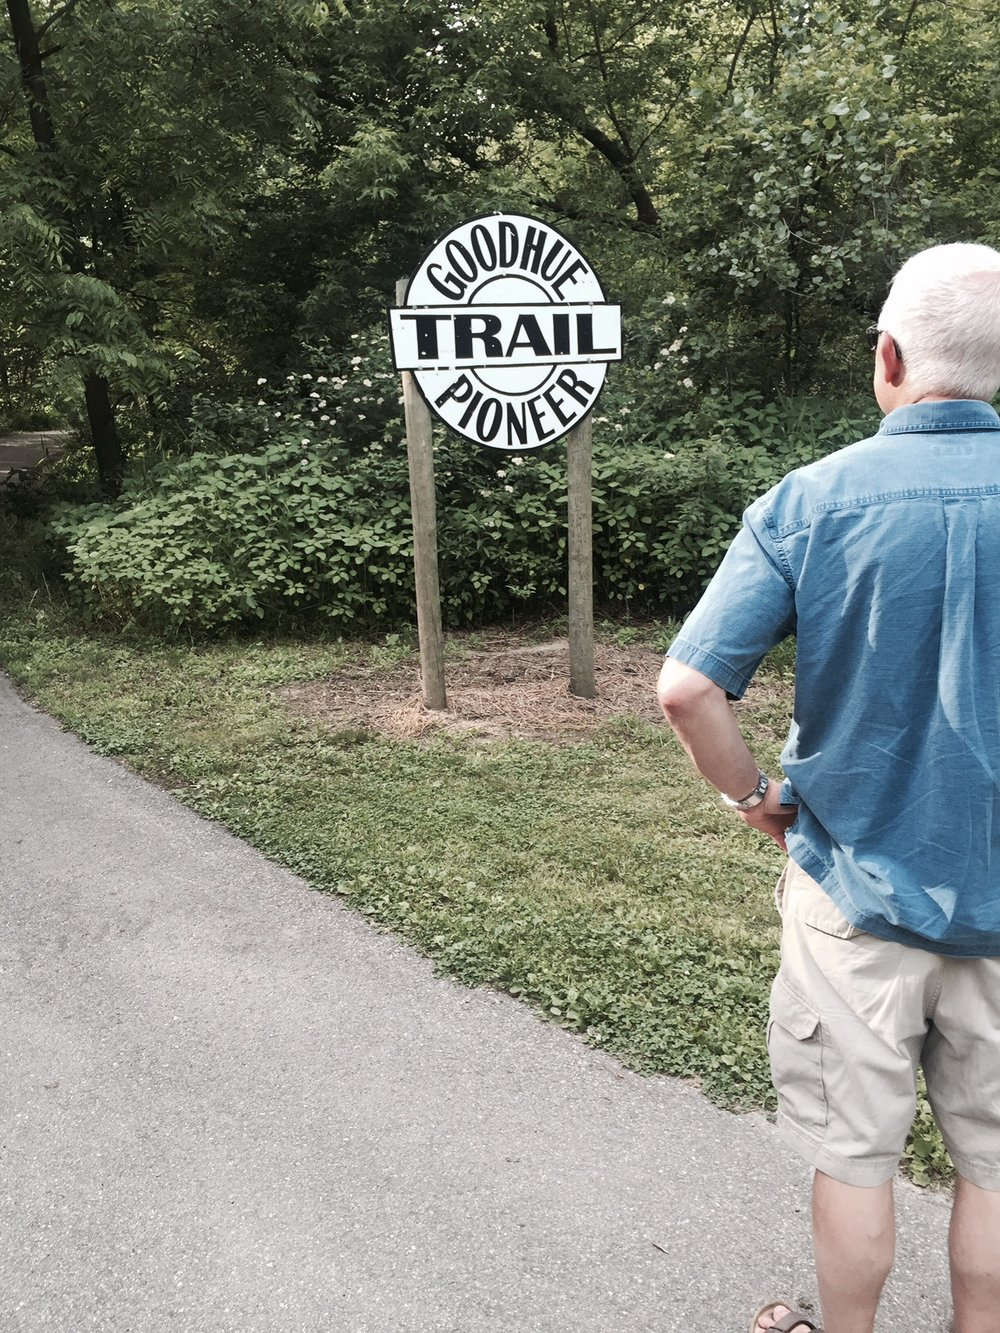 goodhue-pioneer-trail-sign.jpg